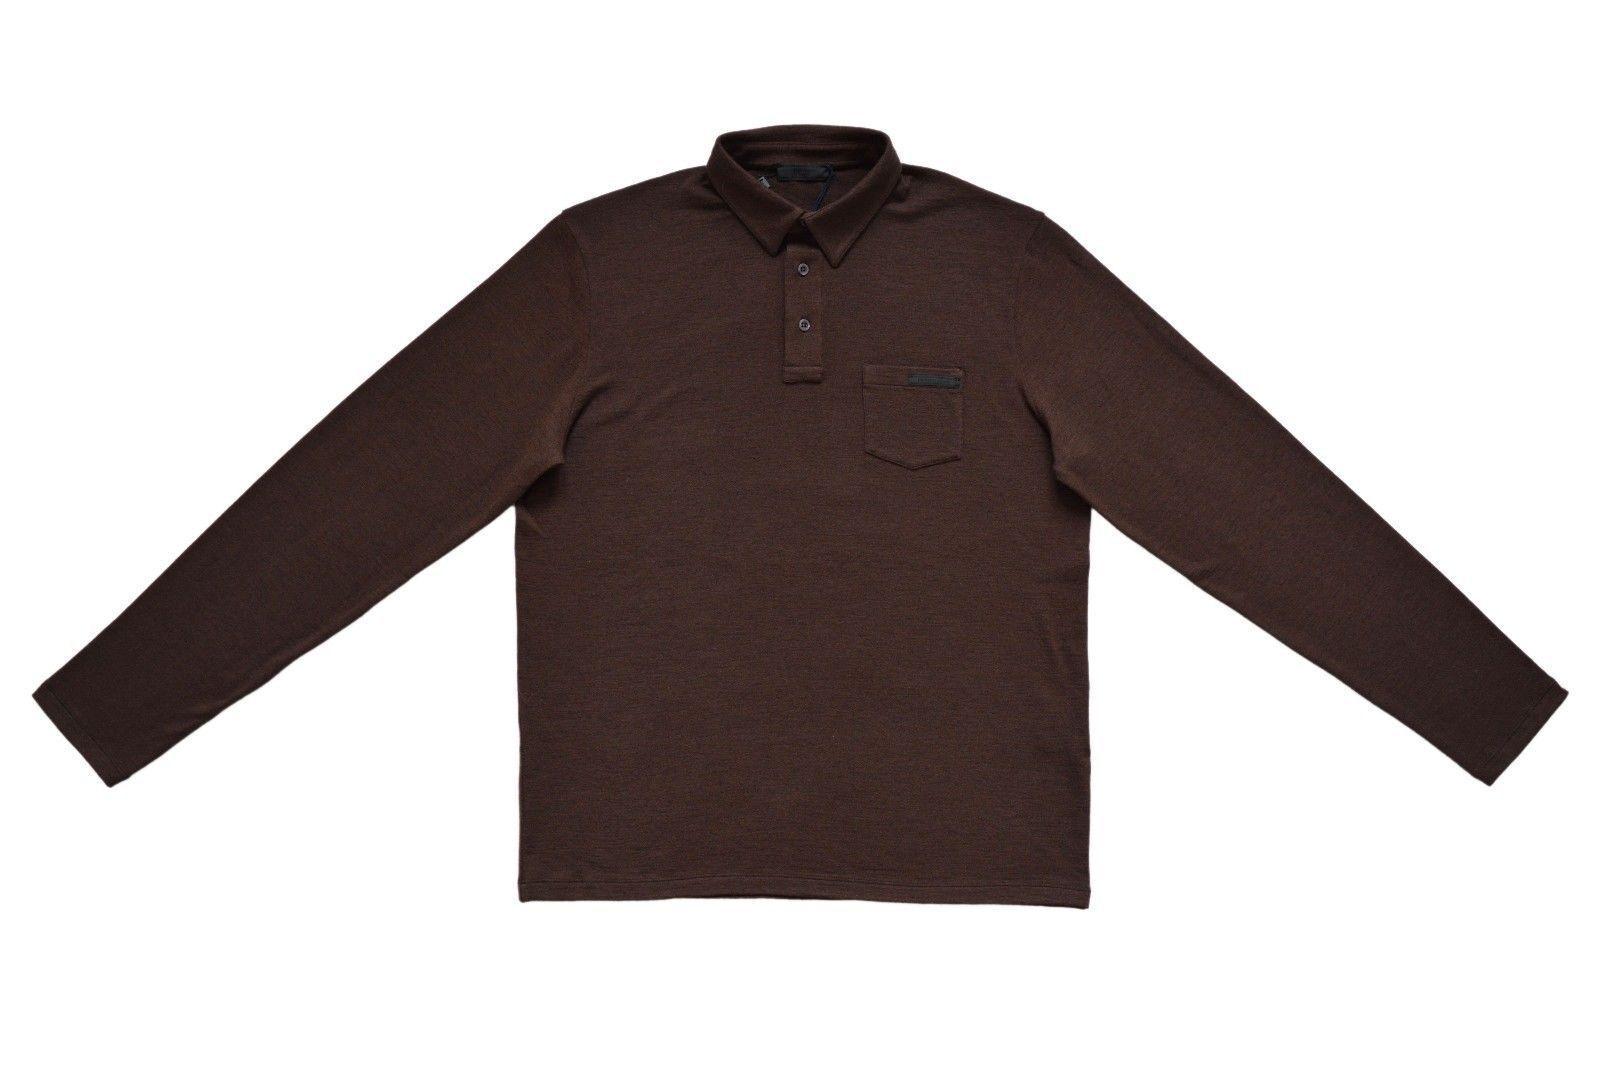 New With Tags NWT PRADA  Herren Virgin Wool Polo Sweater Größe XL